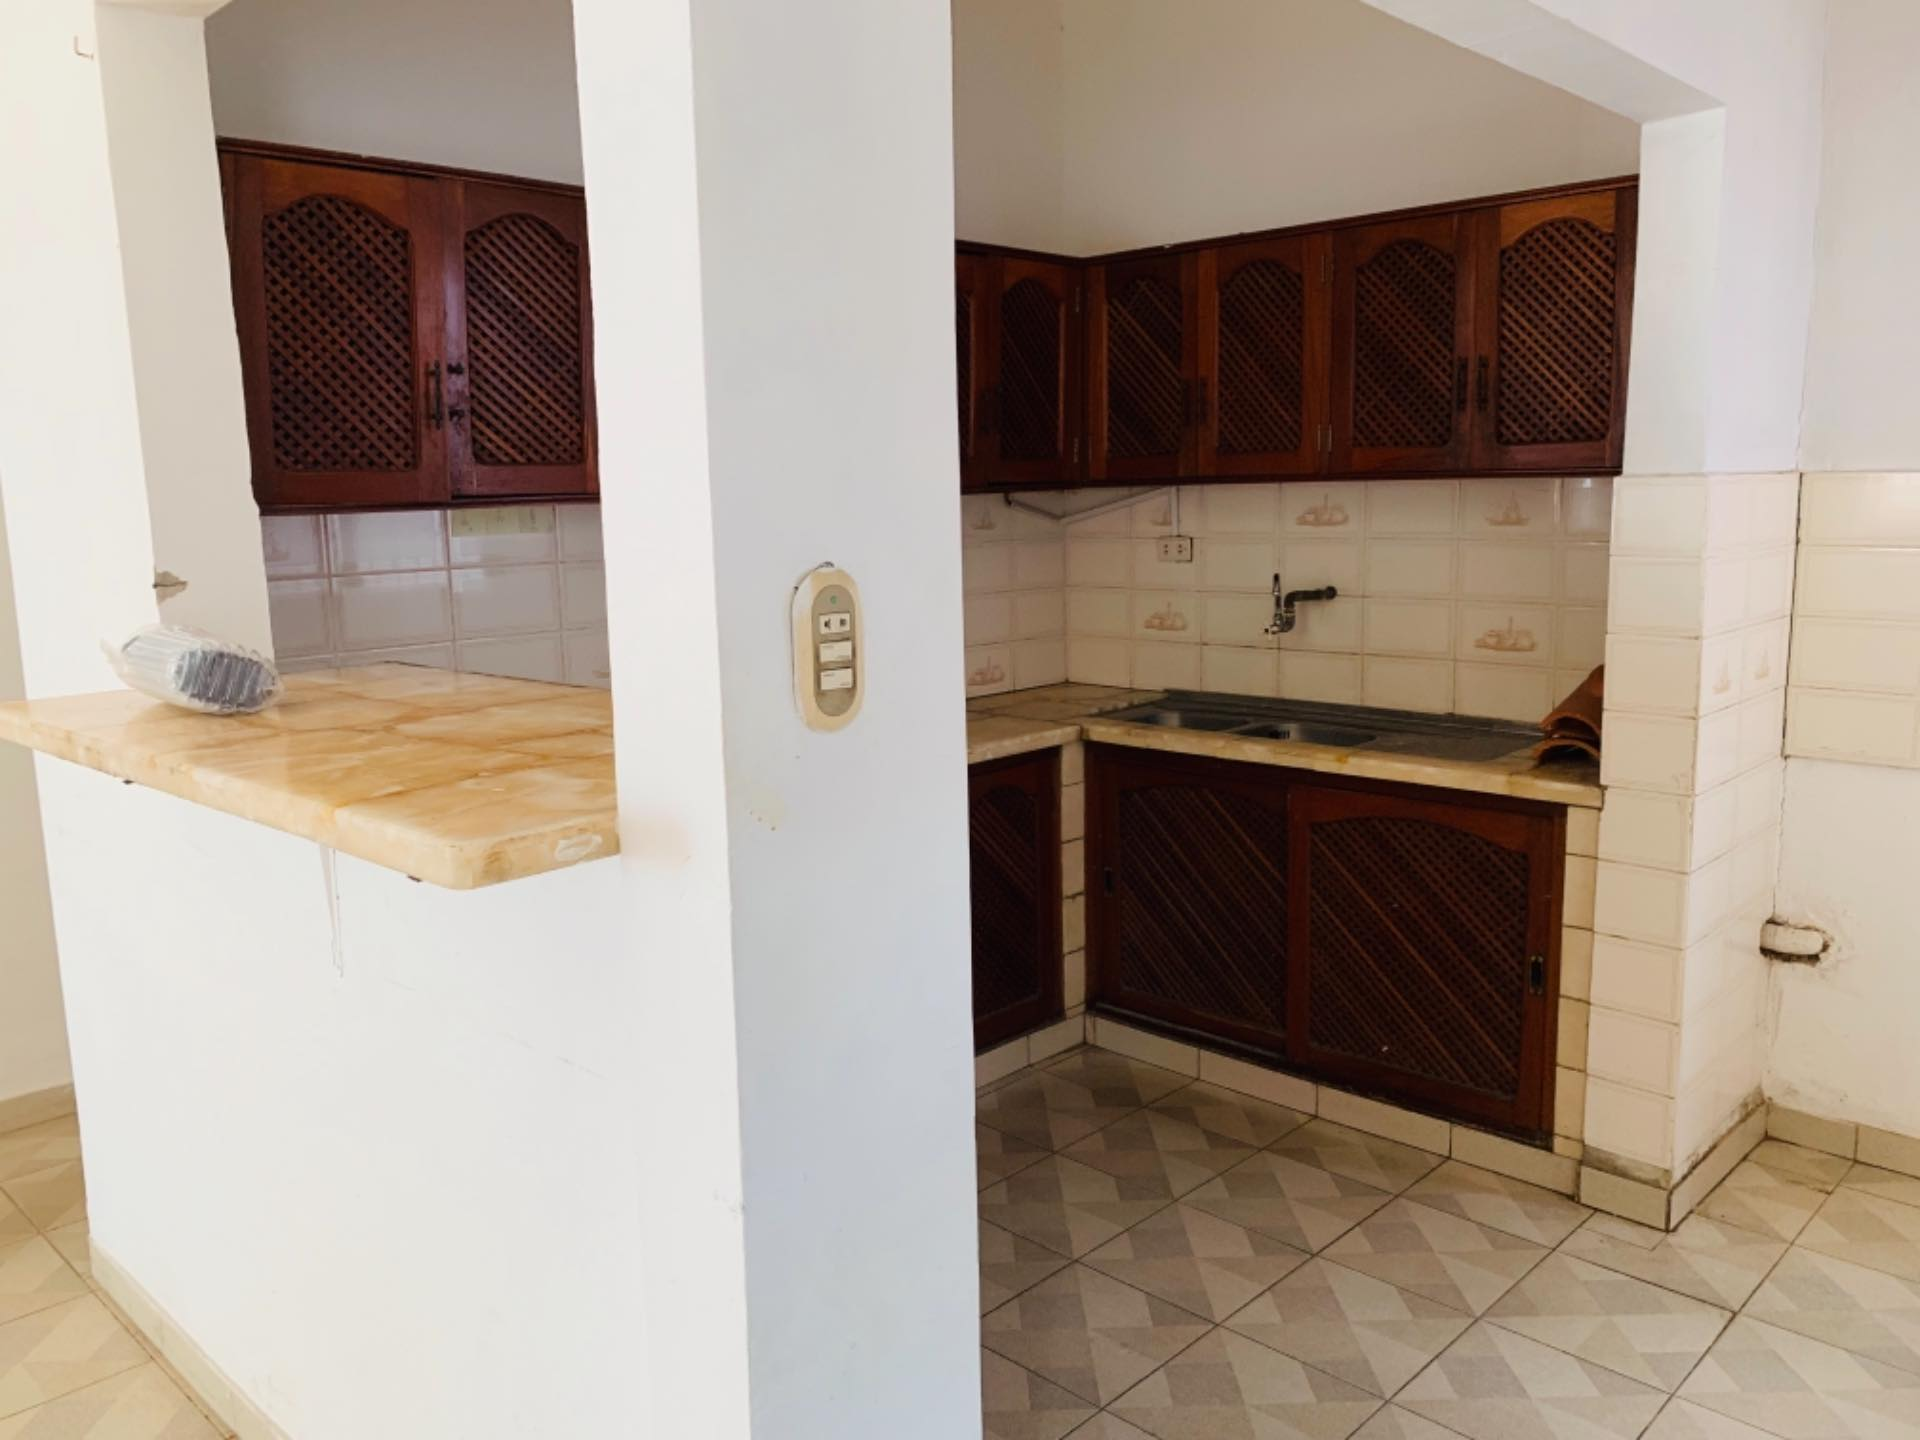 Casa en Alquiler Barrio Equipetrol entre 3er y 4to Anillo Foto 4